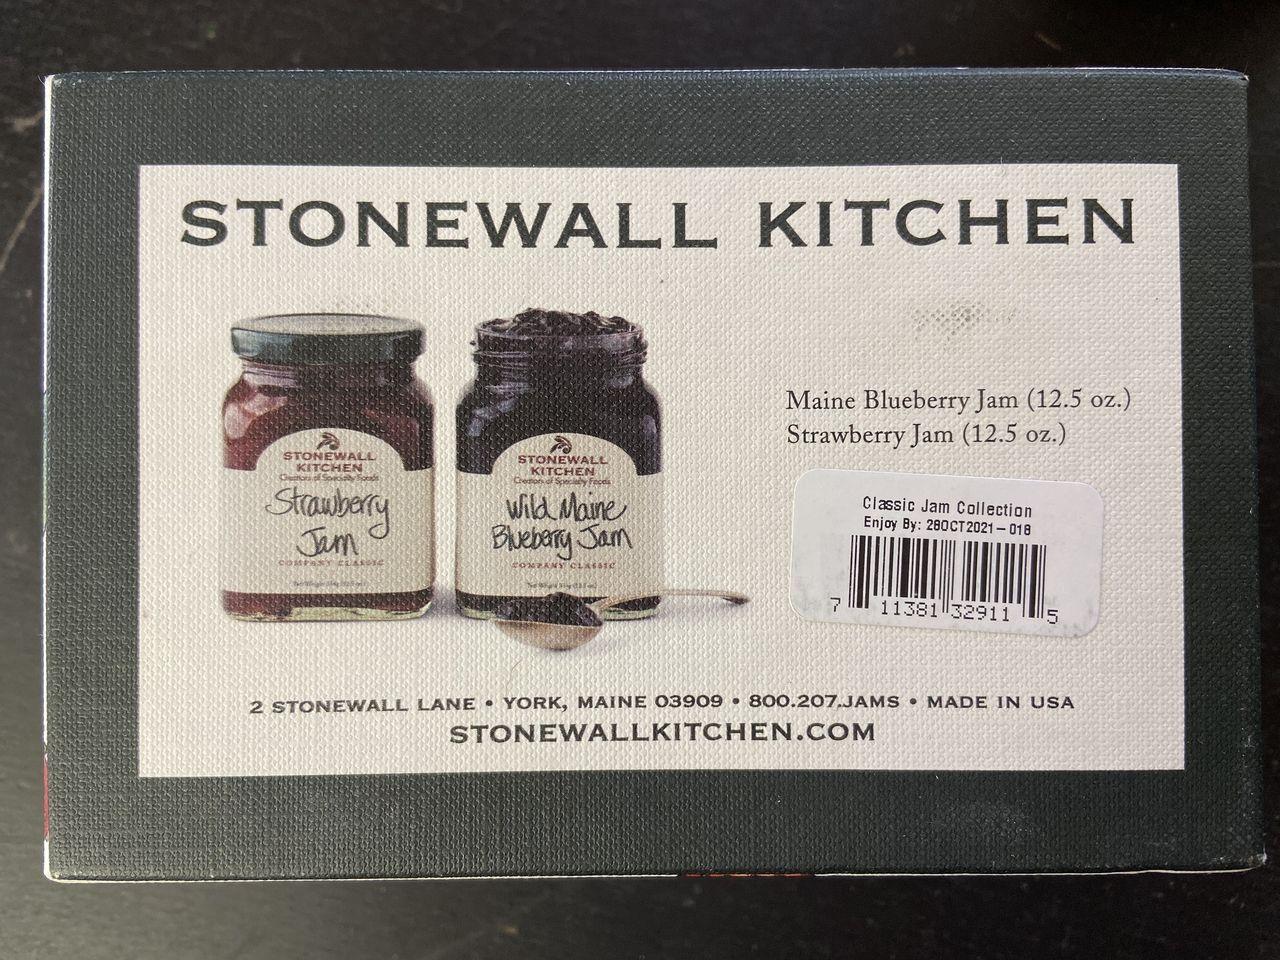 Stonewall Kitchen ストーンウォールキッチン ストロベリージャム、354gとワイルドメインブルーベリージャム、12.5オンス